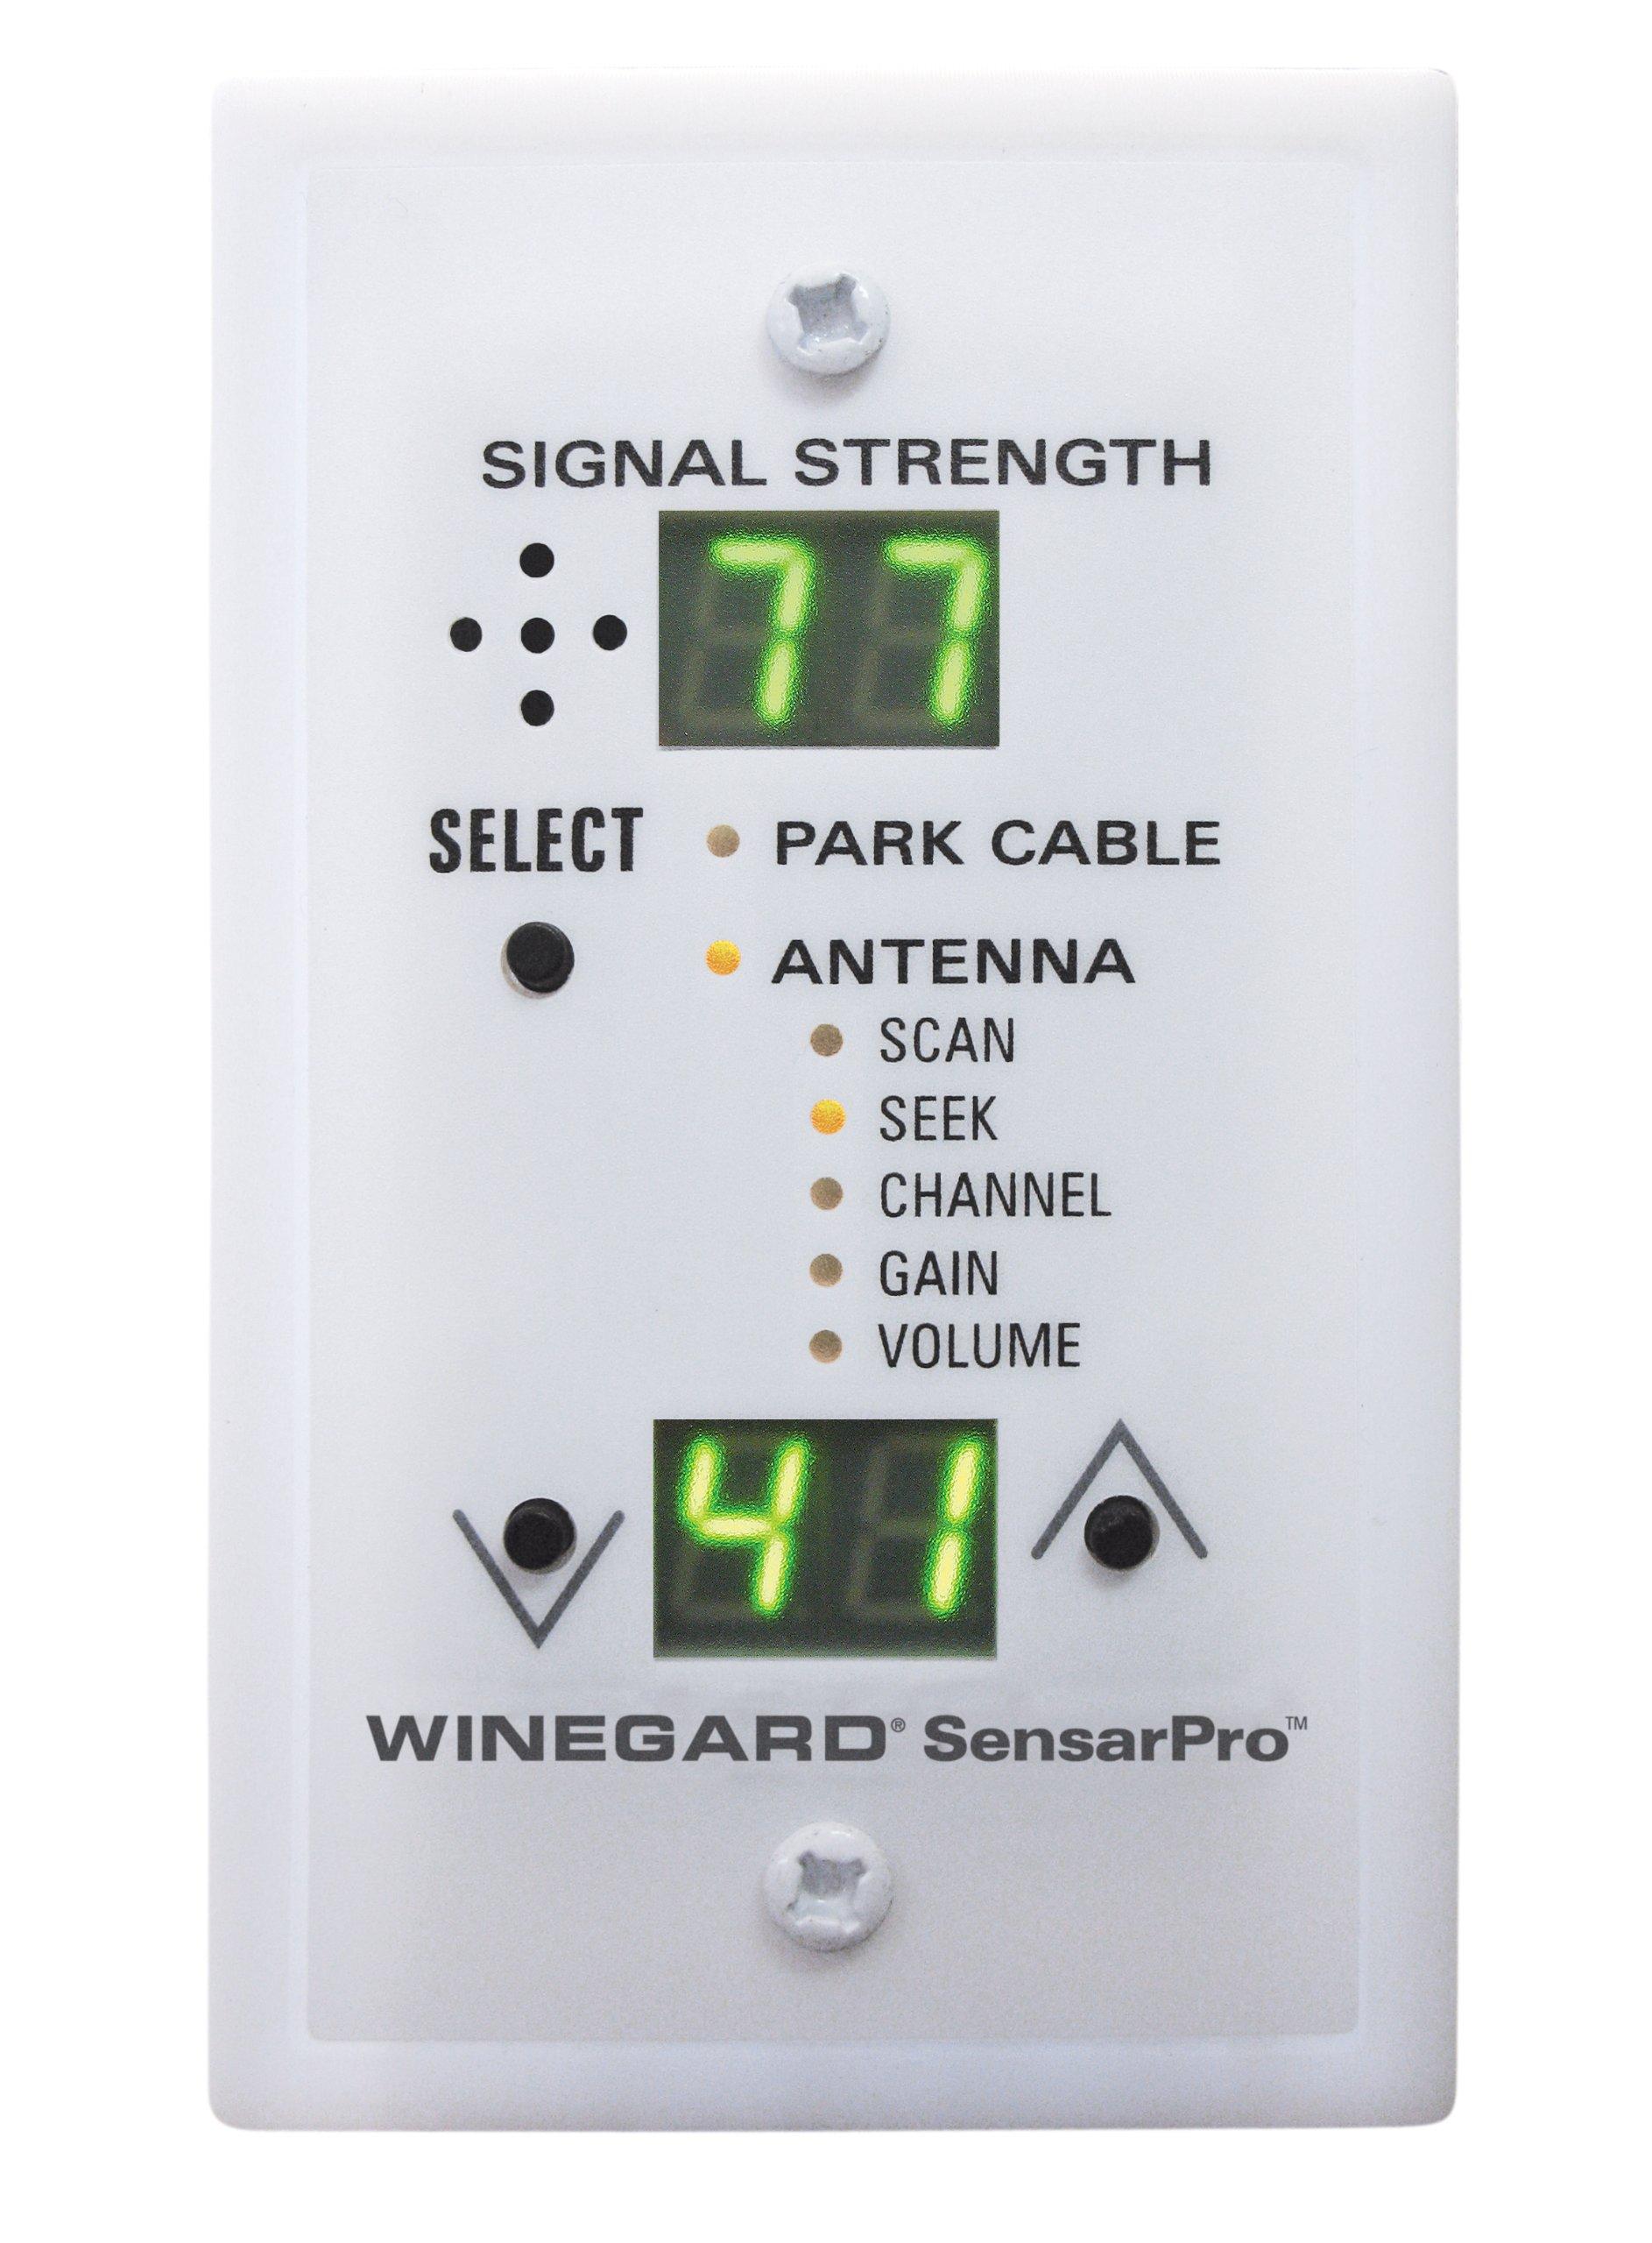 Winegard RFL-342 SensarPro White TV Signal Strength Meter